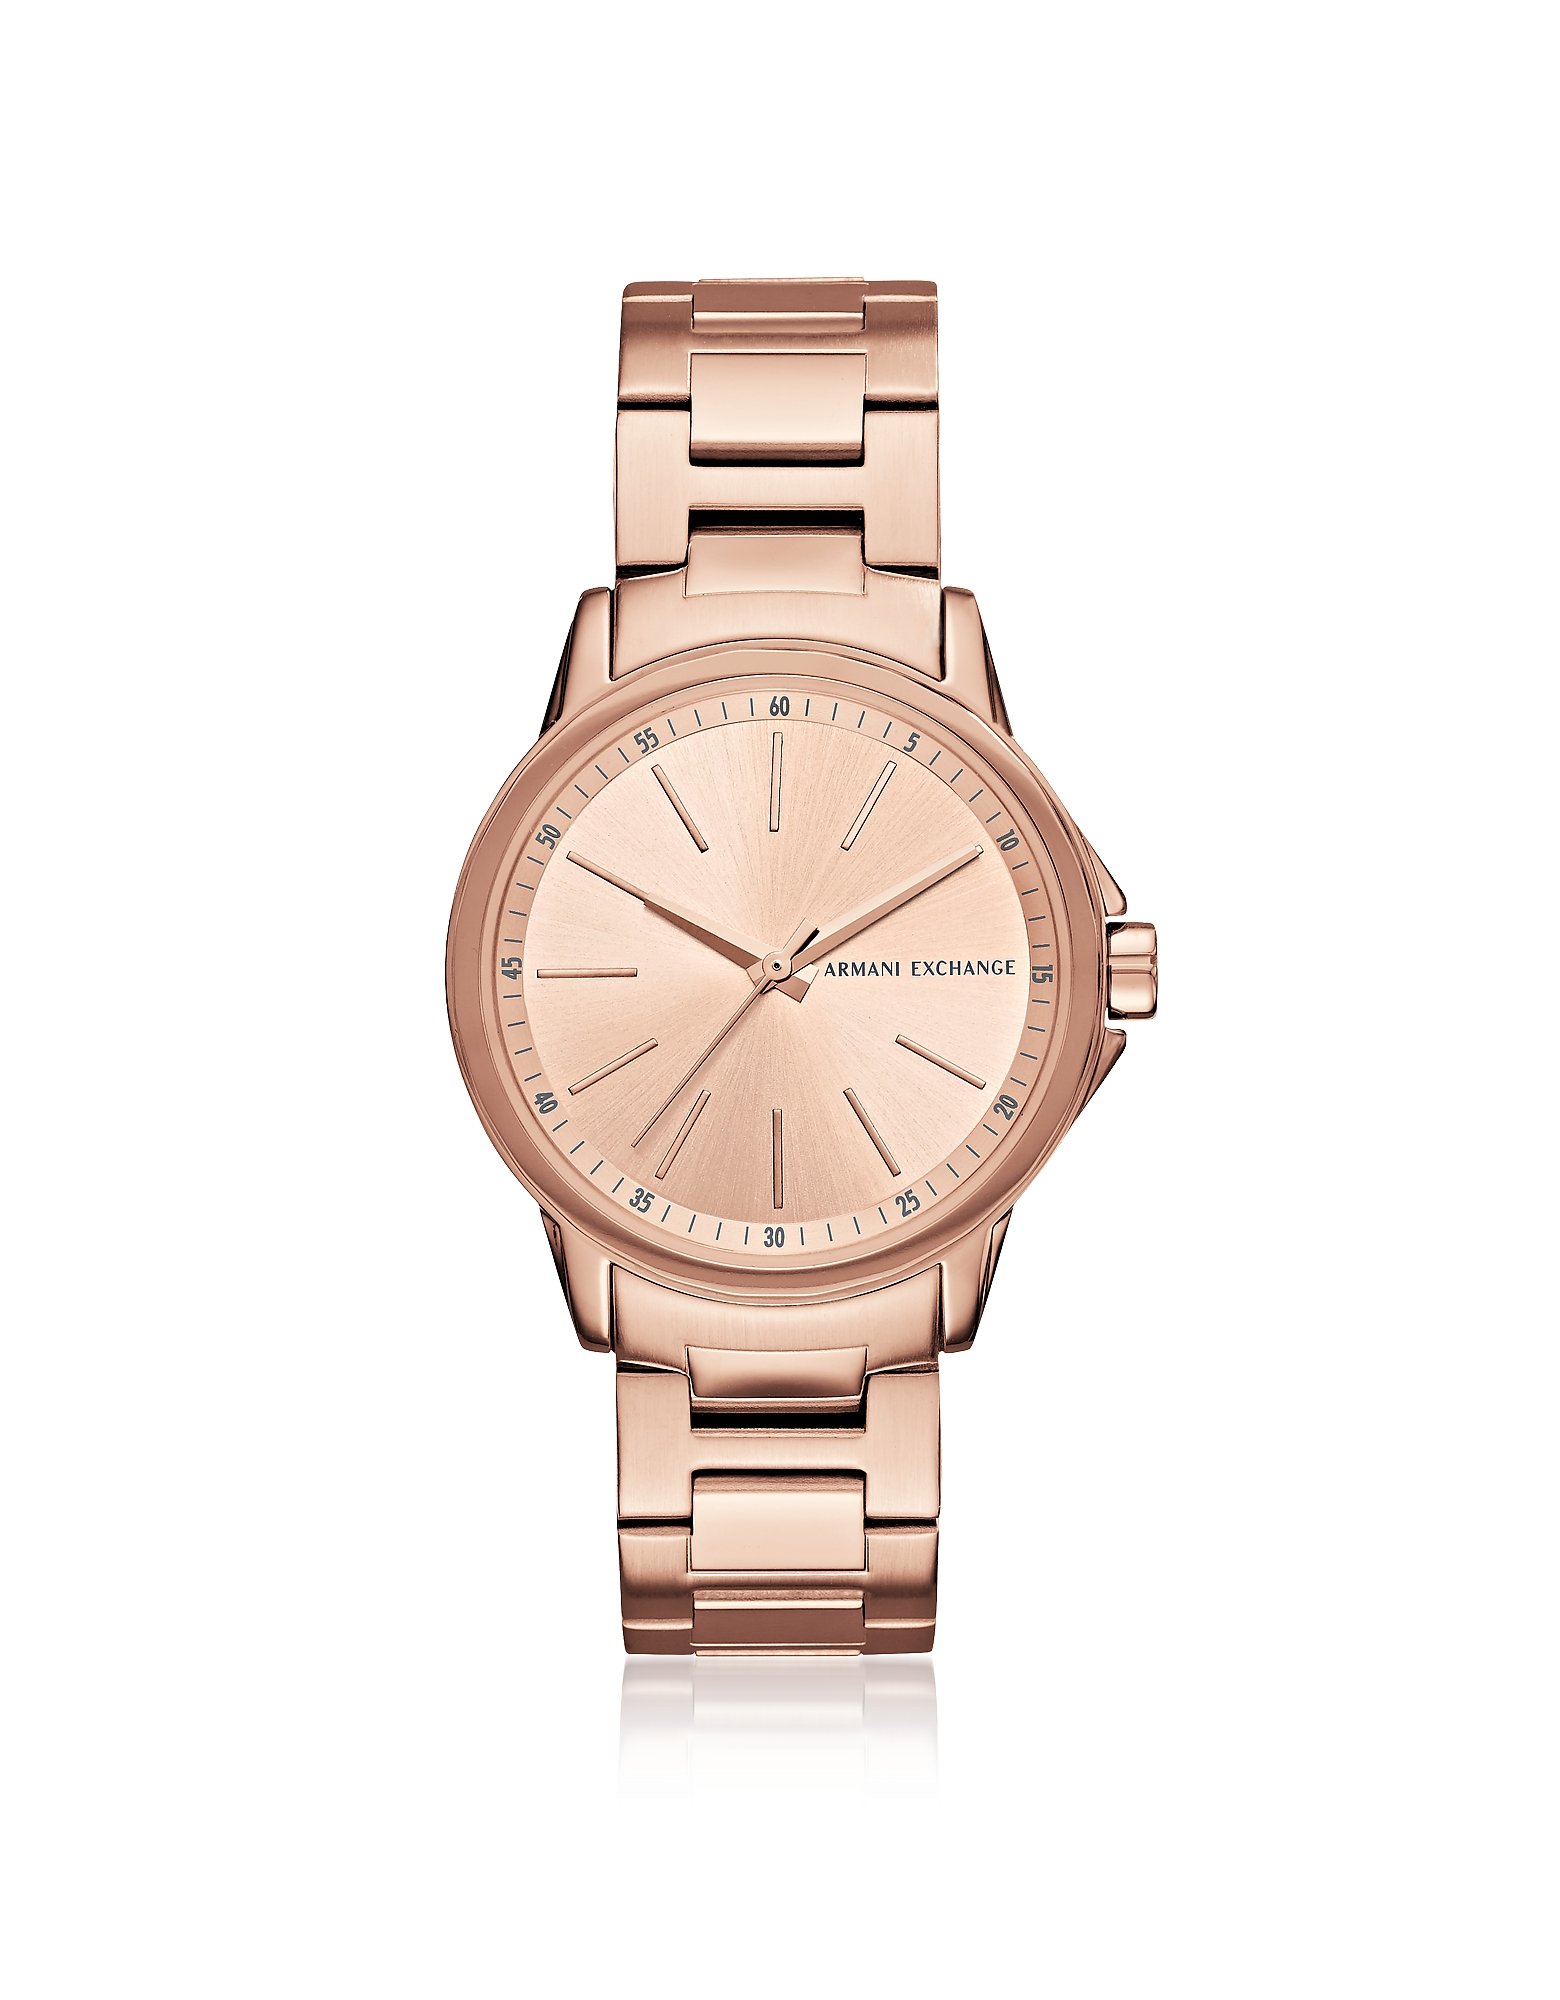 Armani Exchange Women's Watches, Lady Banks Rose PVD Women's Watch